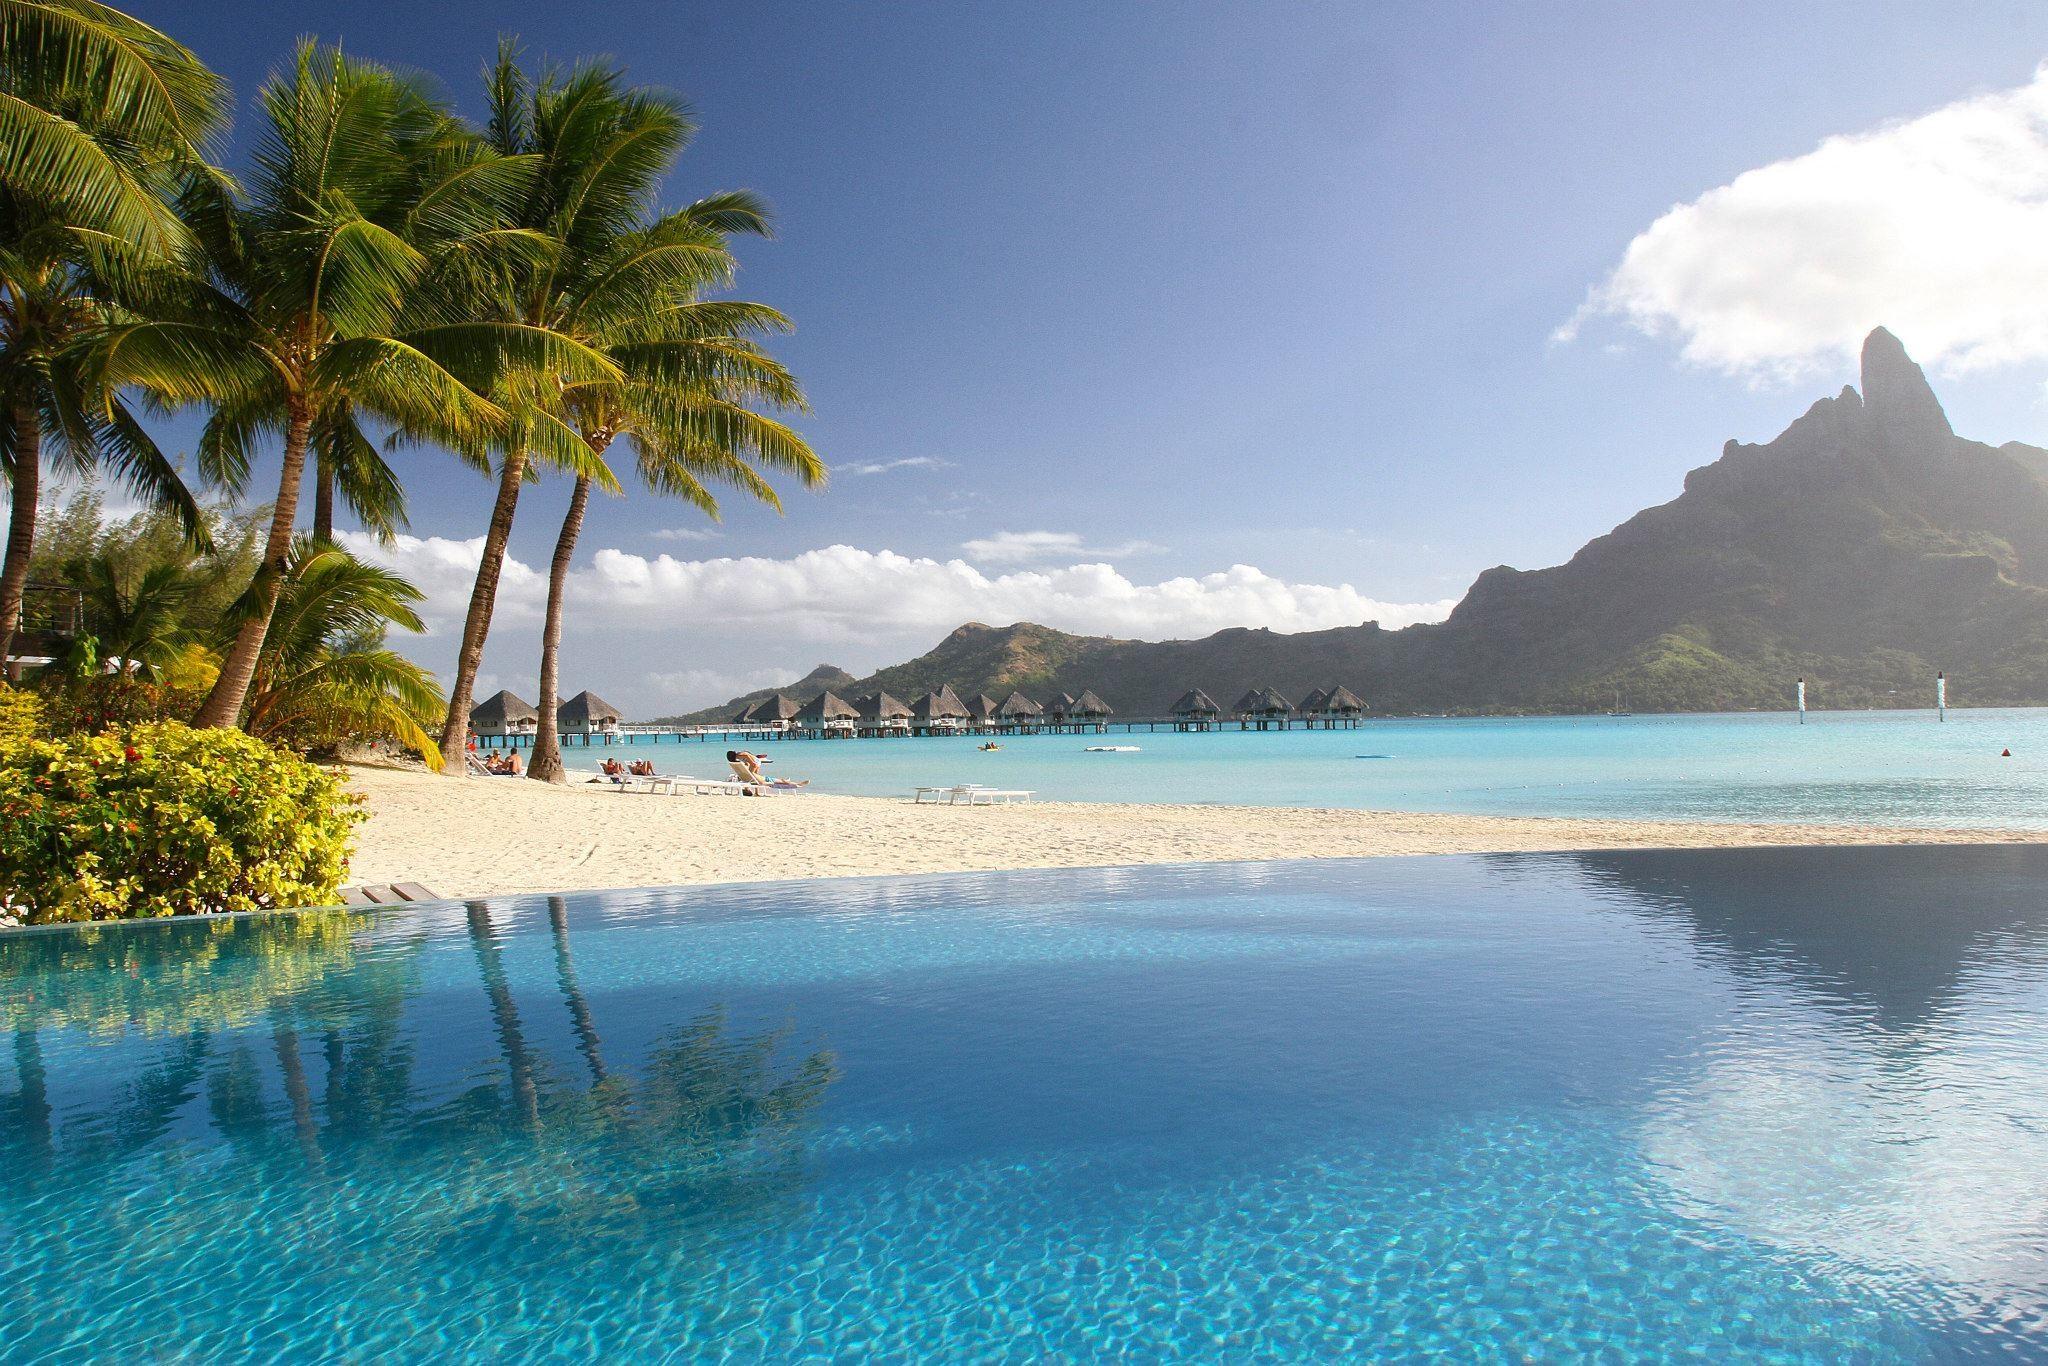 Lagoon Tropical Island: Wallpaper : Landscape, Sea, Bay, Shore, Beach, Coast, Palm